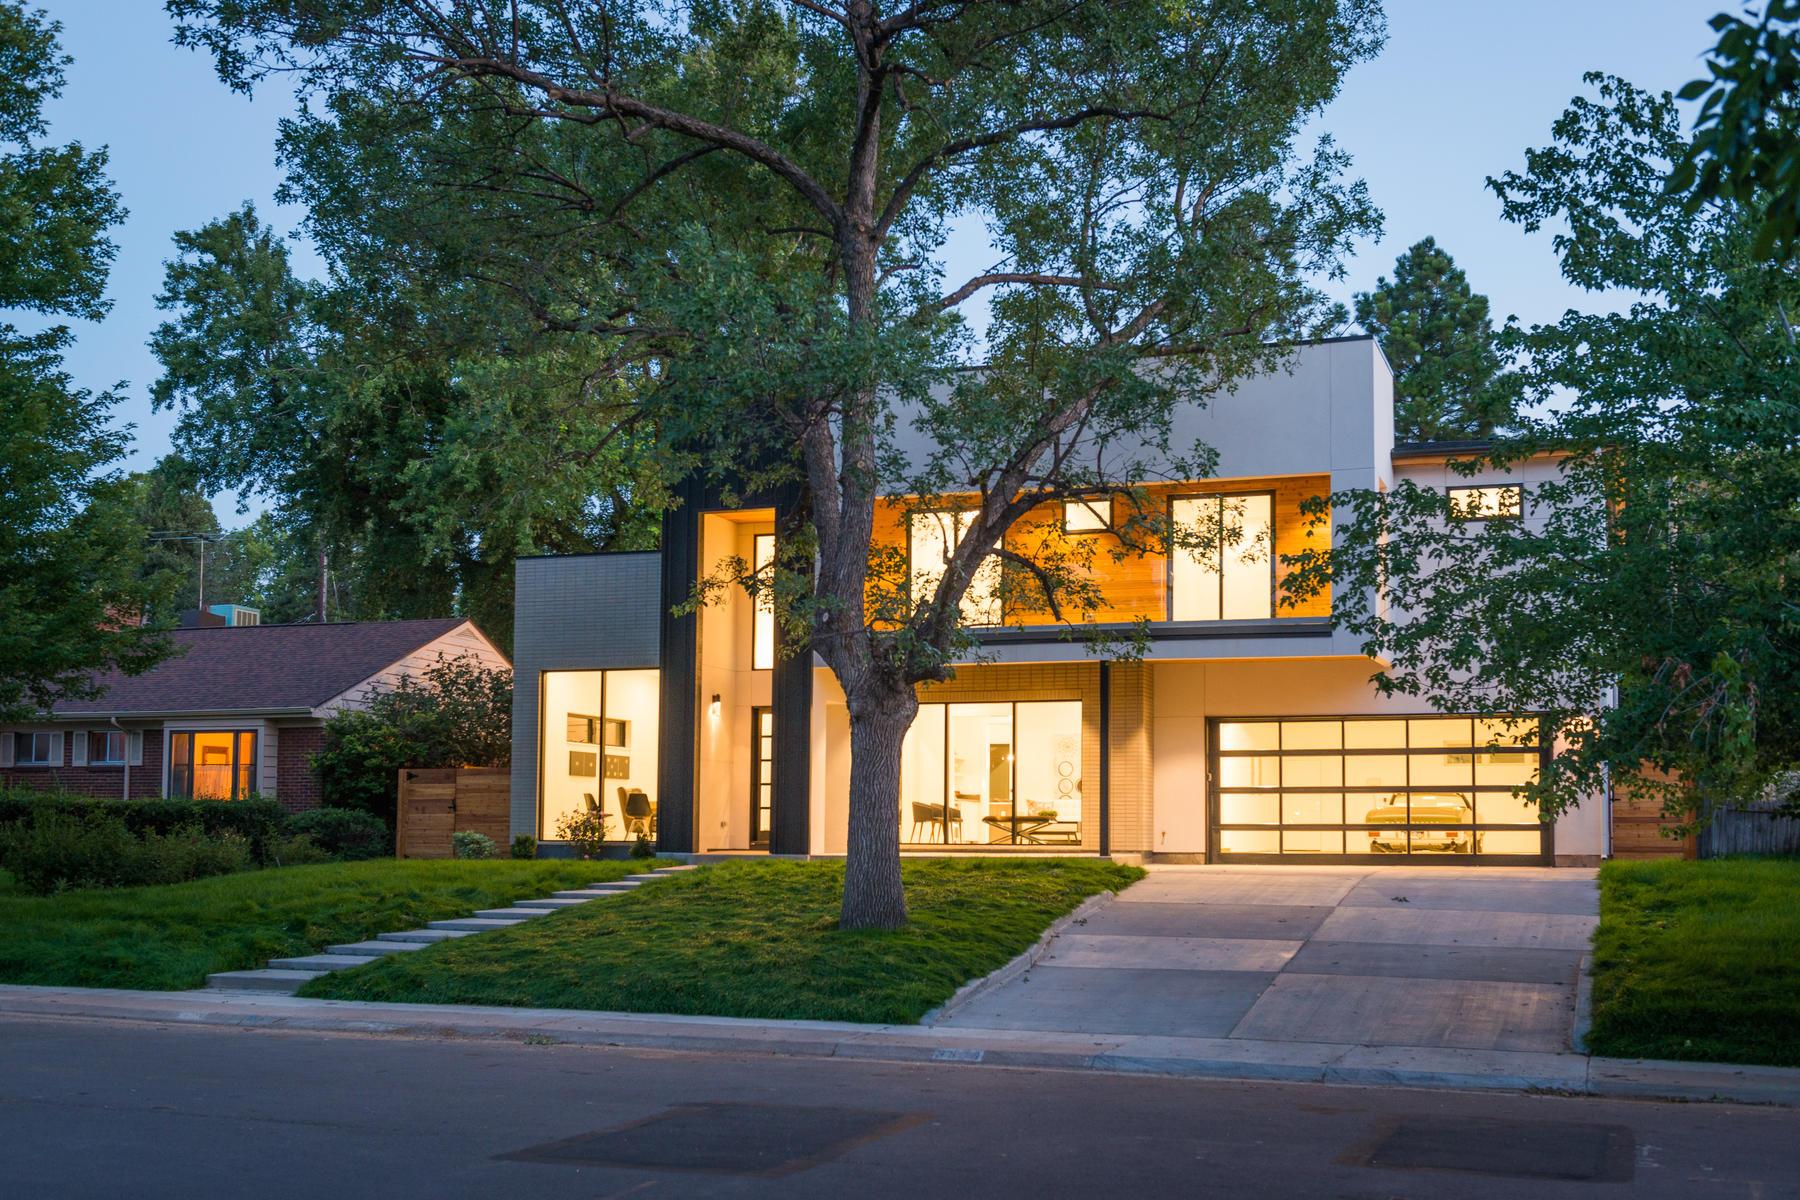 Single Family Home for Sale at 3528 East Virginia Avenue Denver, Colorado, 80209 United States